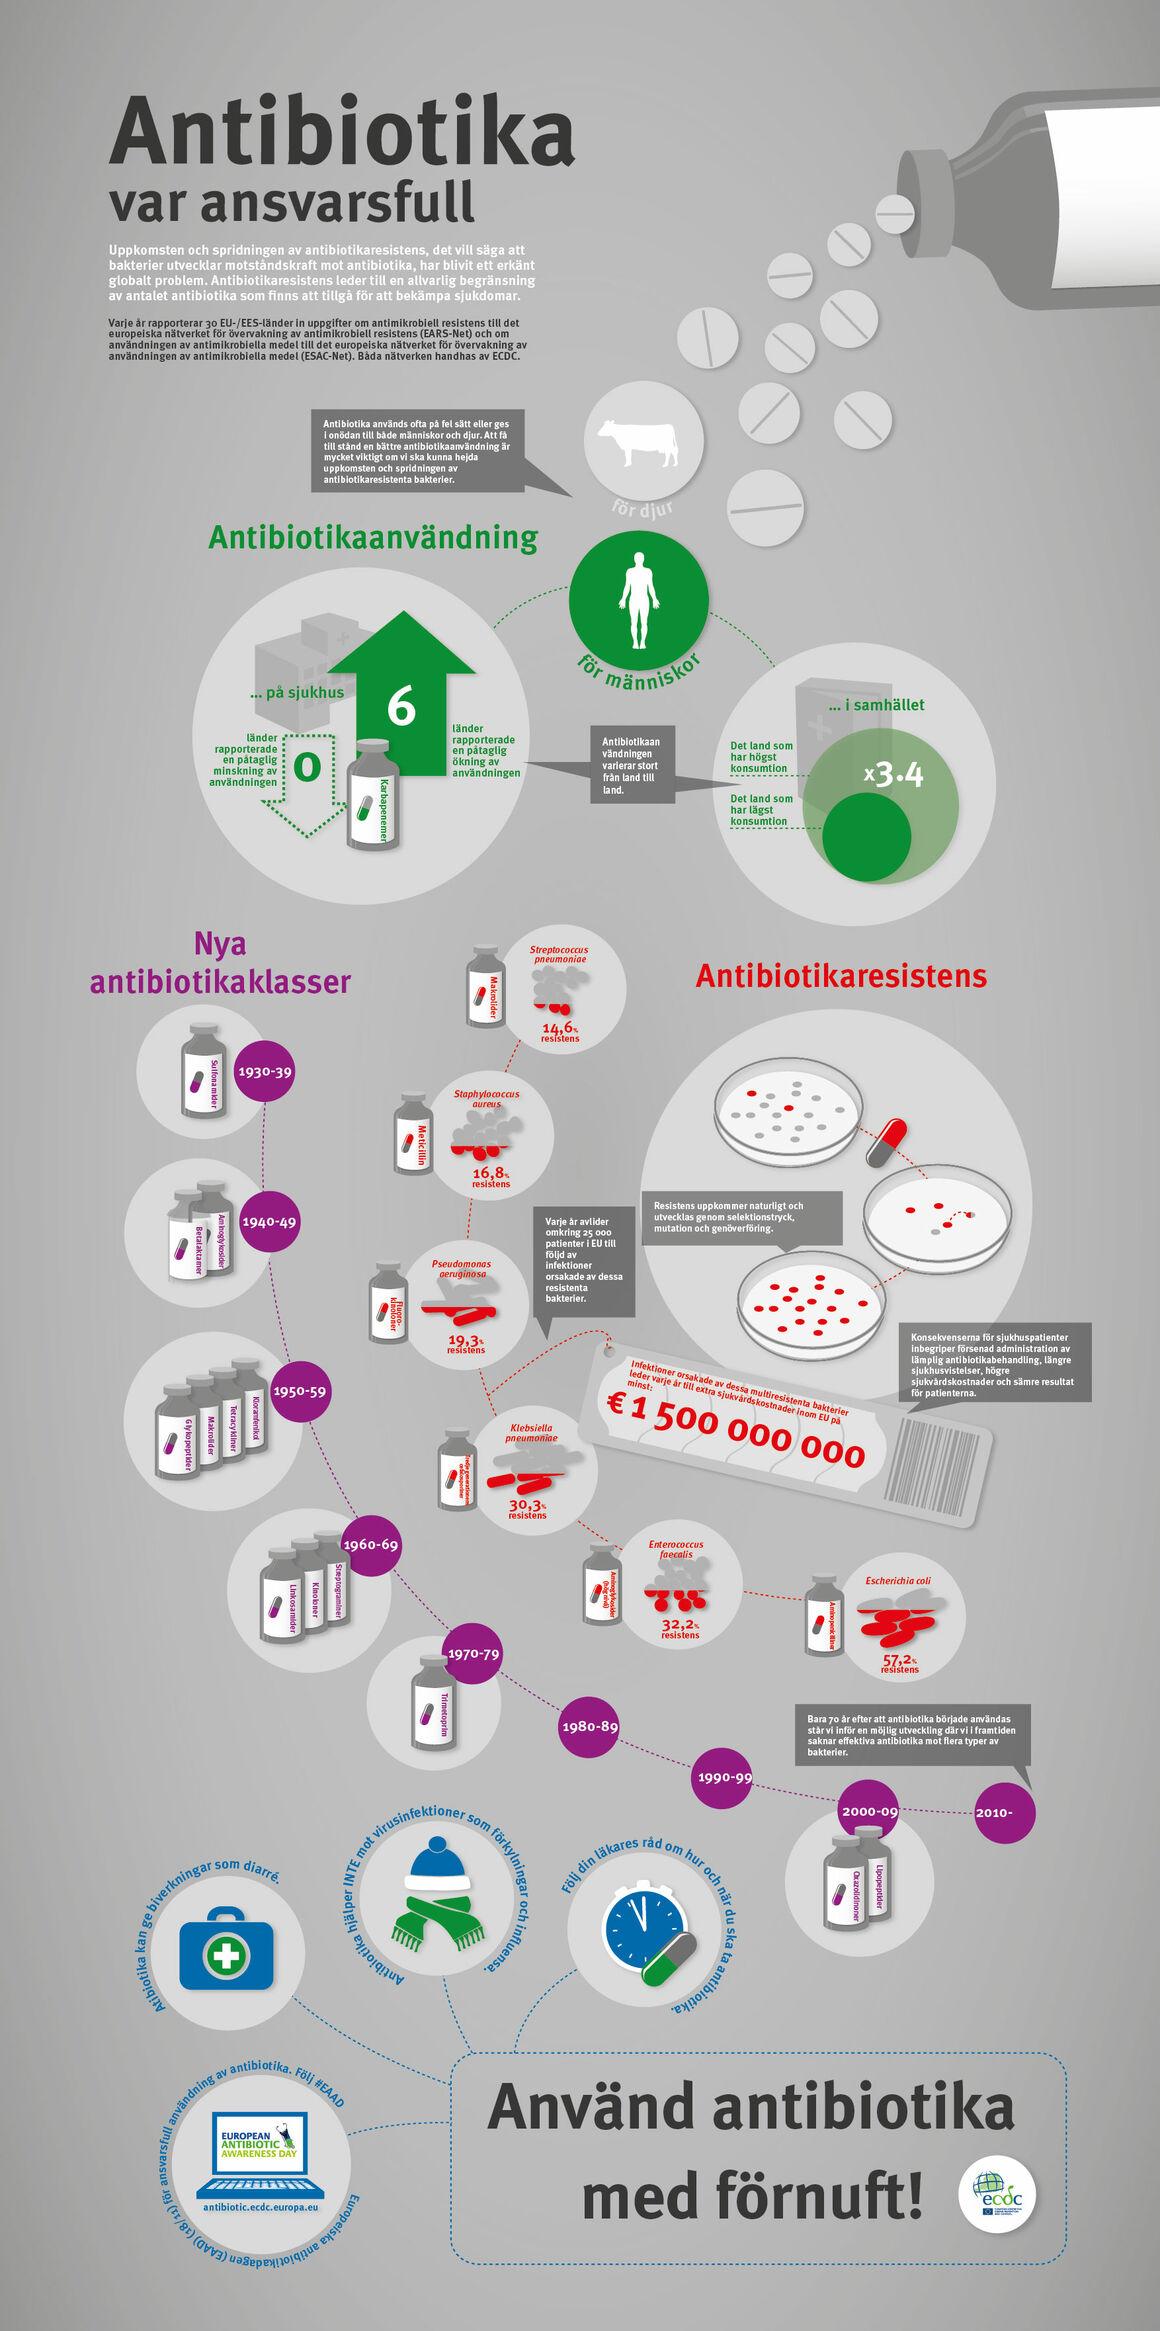 Antibiotika - var ansvarsfull